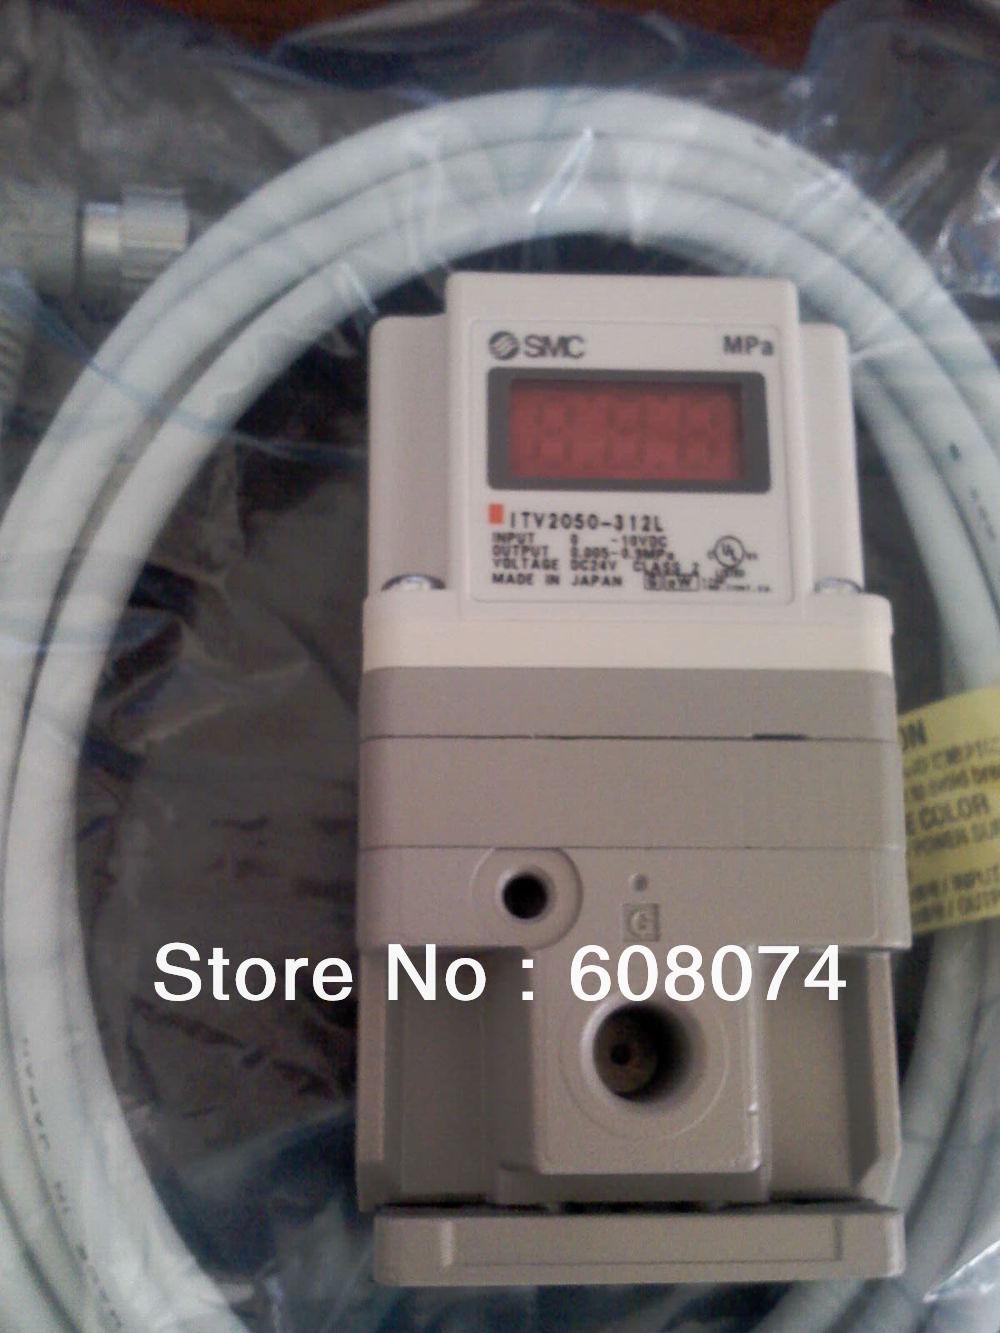 ITV2010-012BS ELECTRO PNEUMATIC REGULATOR, 24VDC Rc1/4 PORT 0.005~0.1MPa itv2030 312l electro pneumatic regulator 24vdc 1 4 port 0 10v input